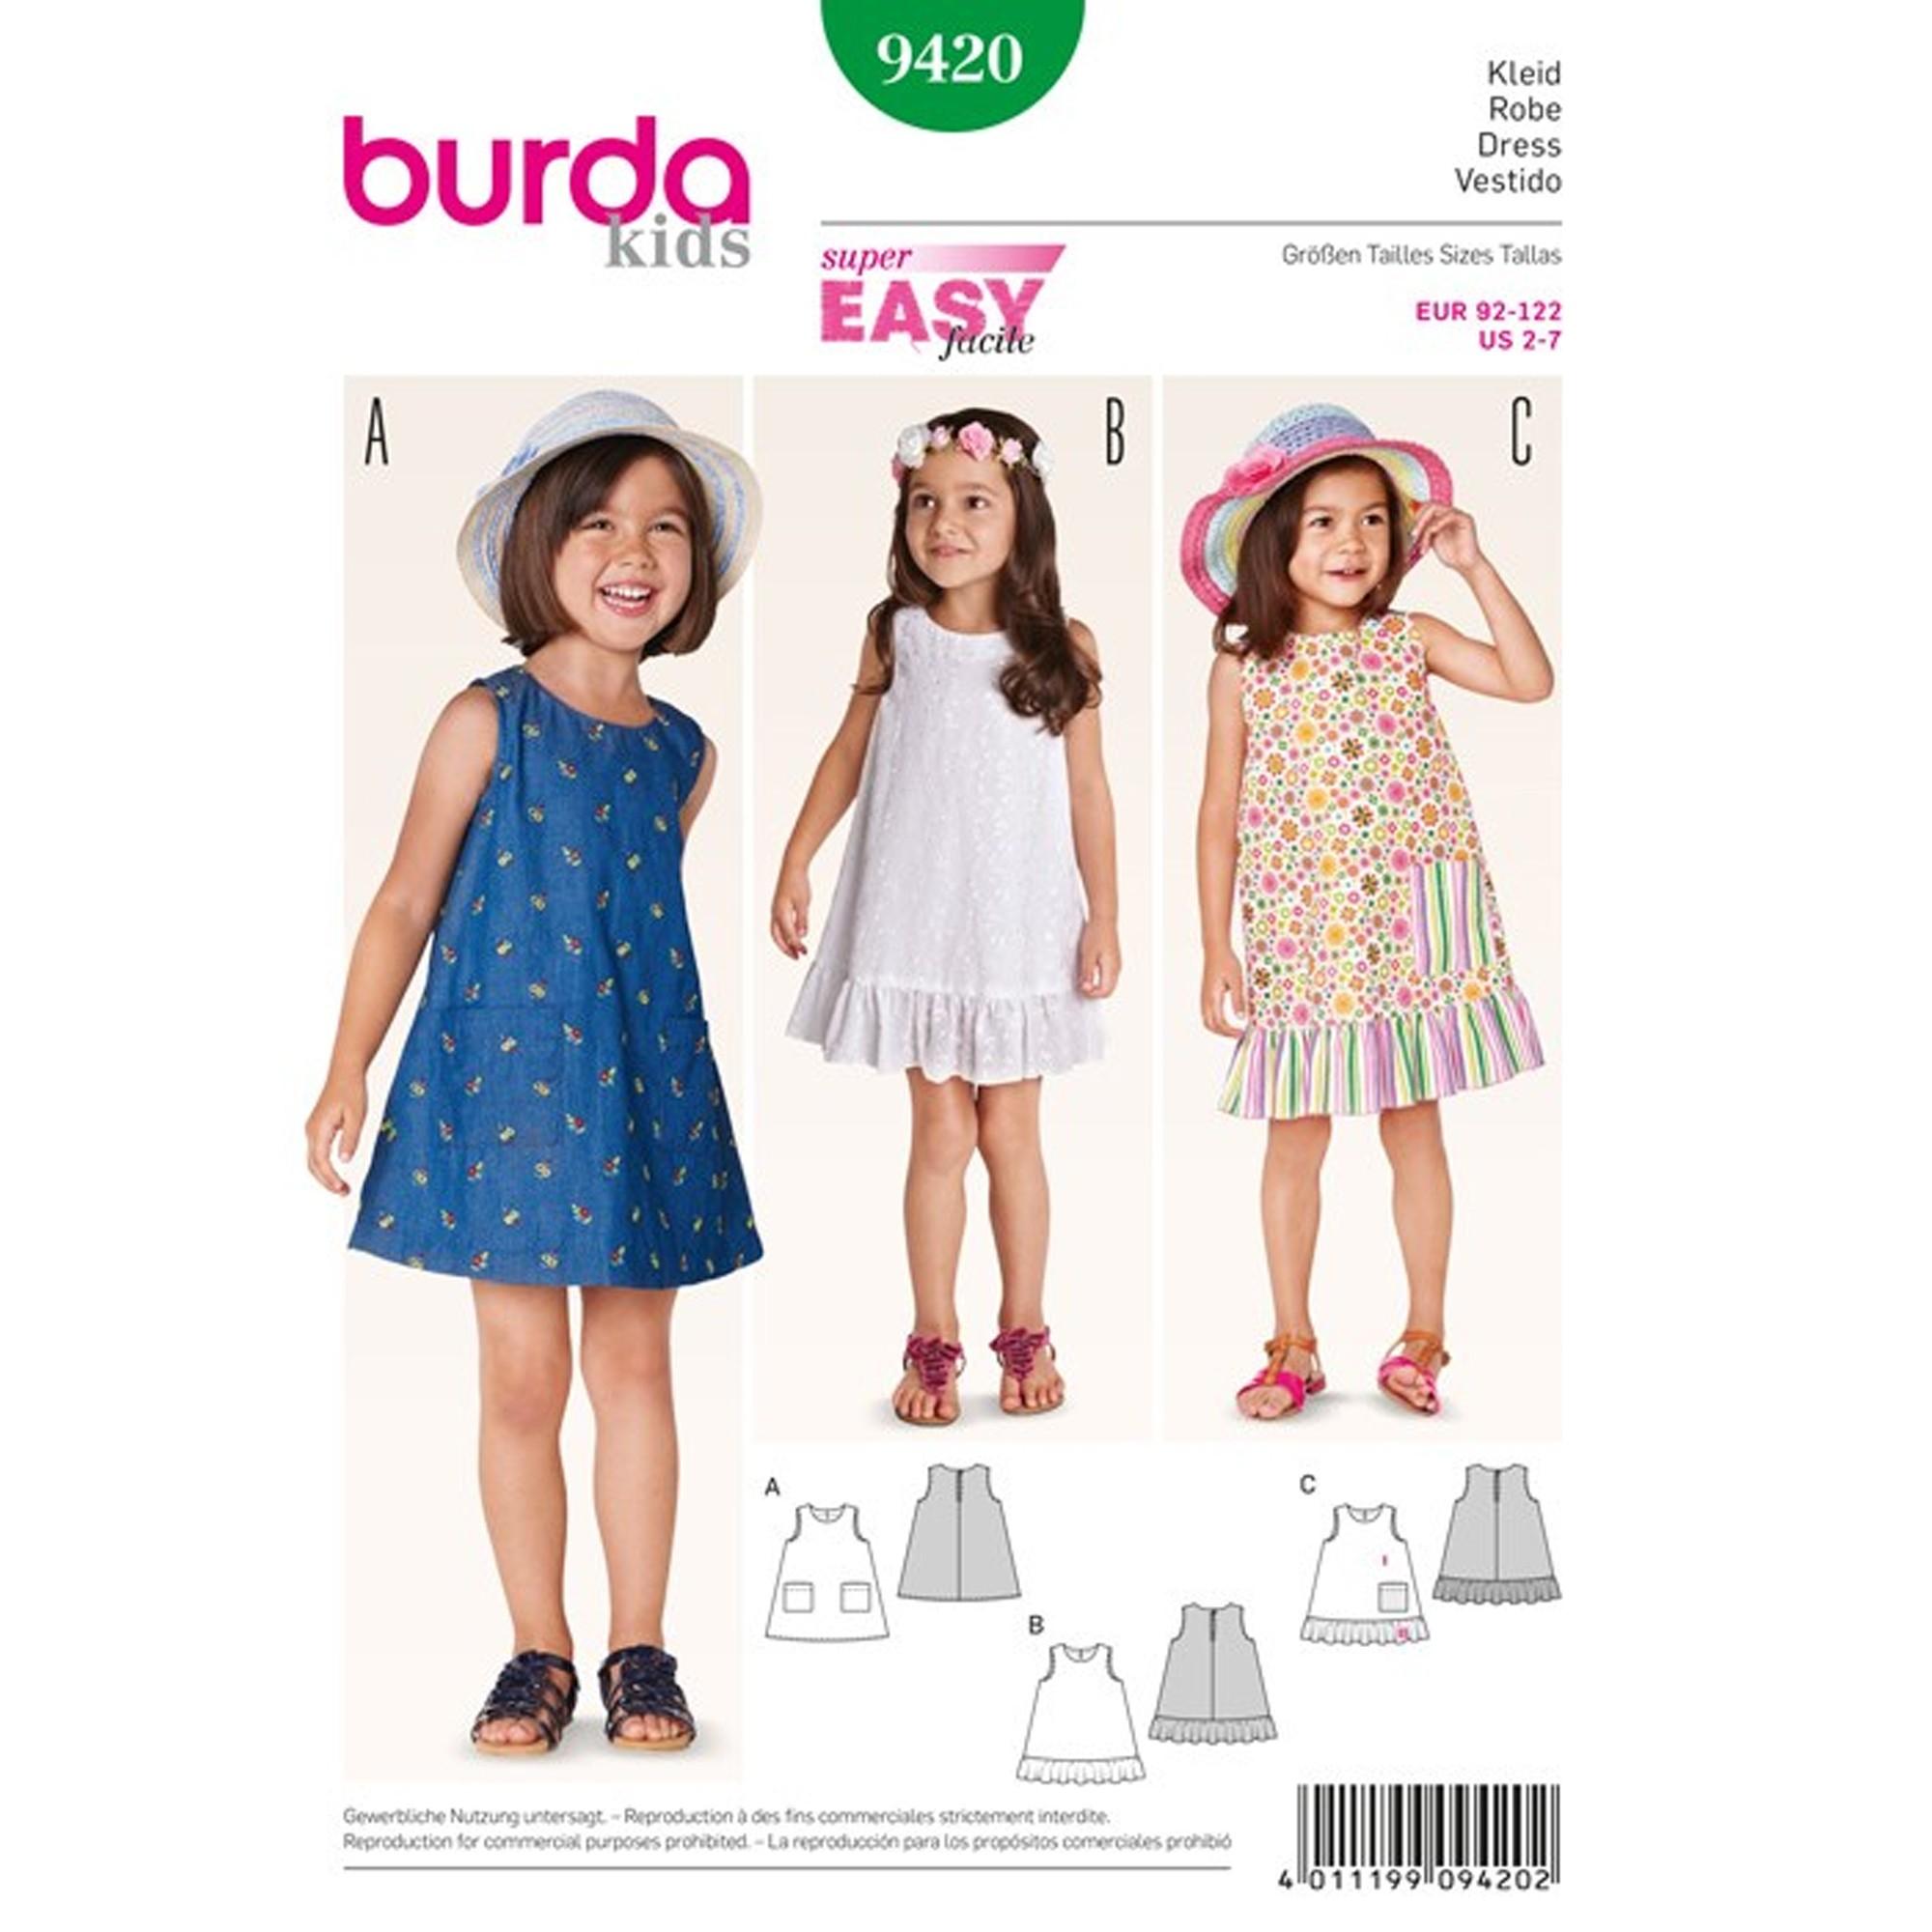 Robe Patron Burda N°9420 Kids Patron PXOkuiZT